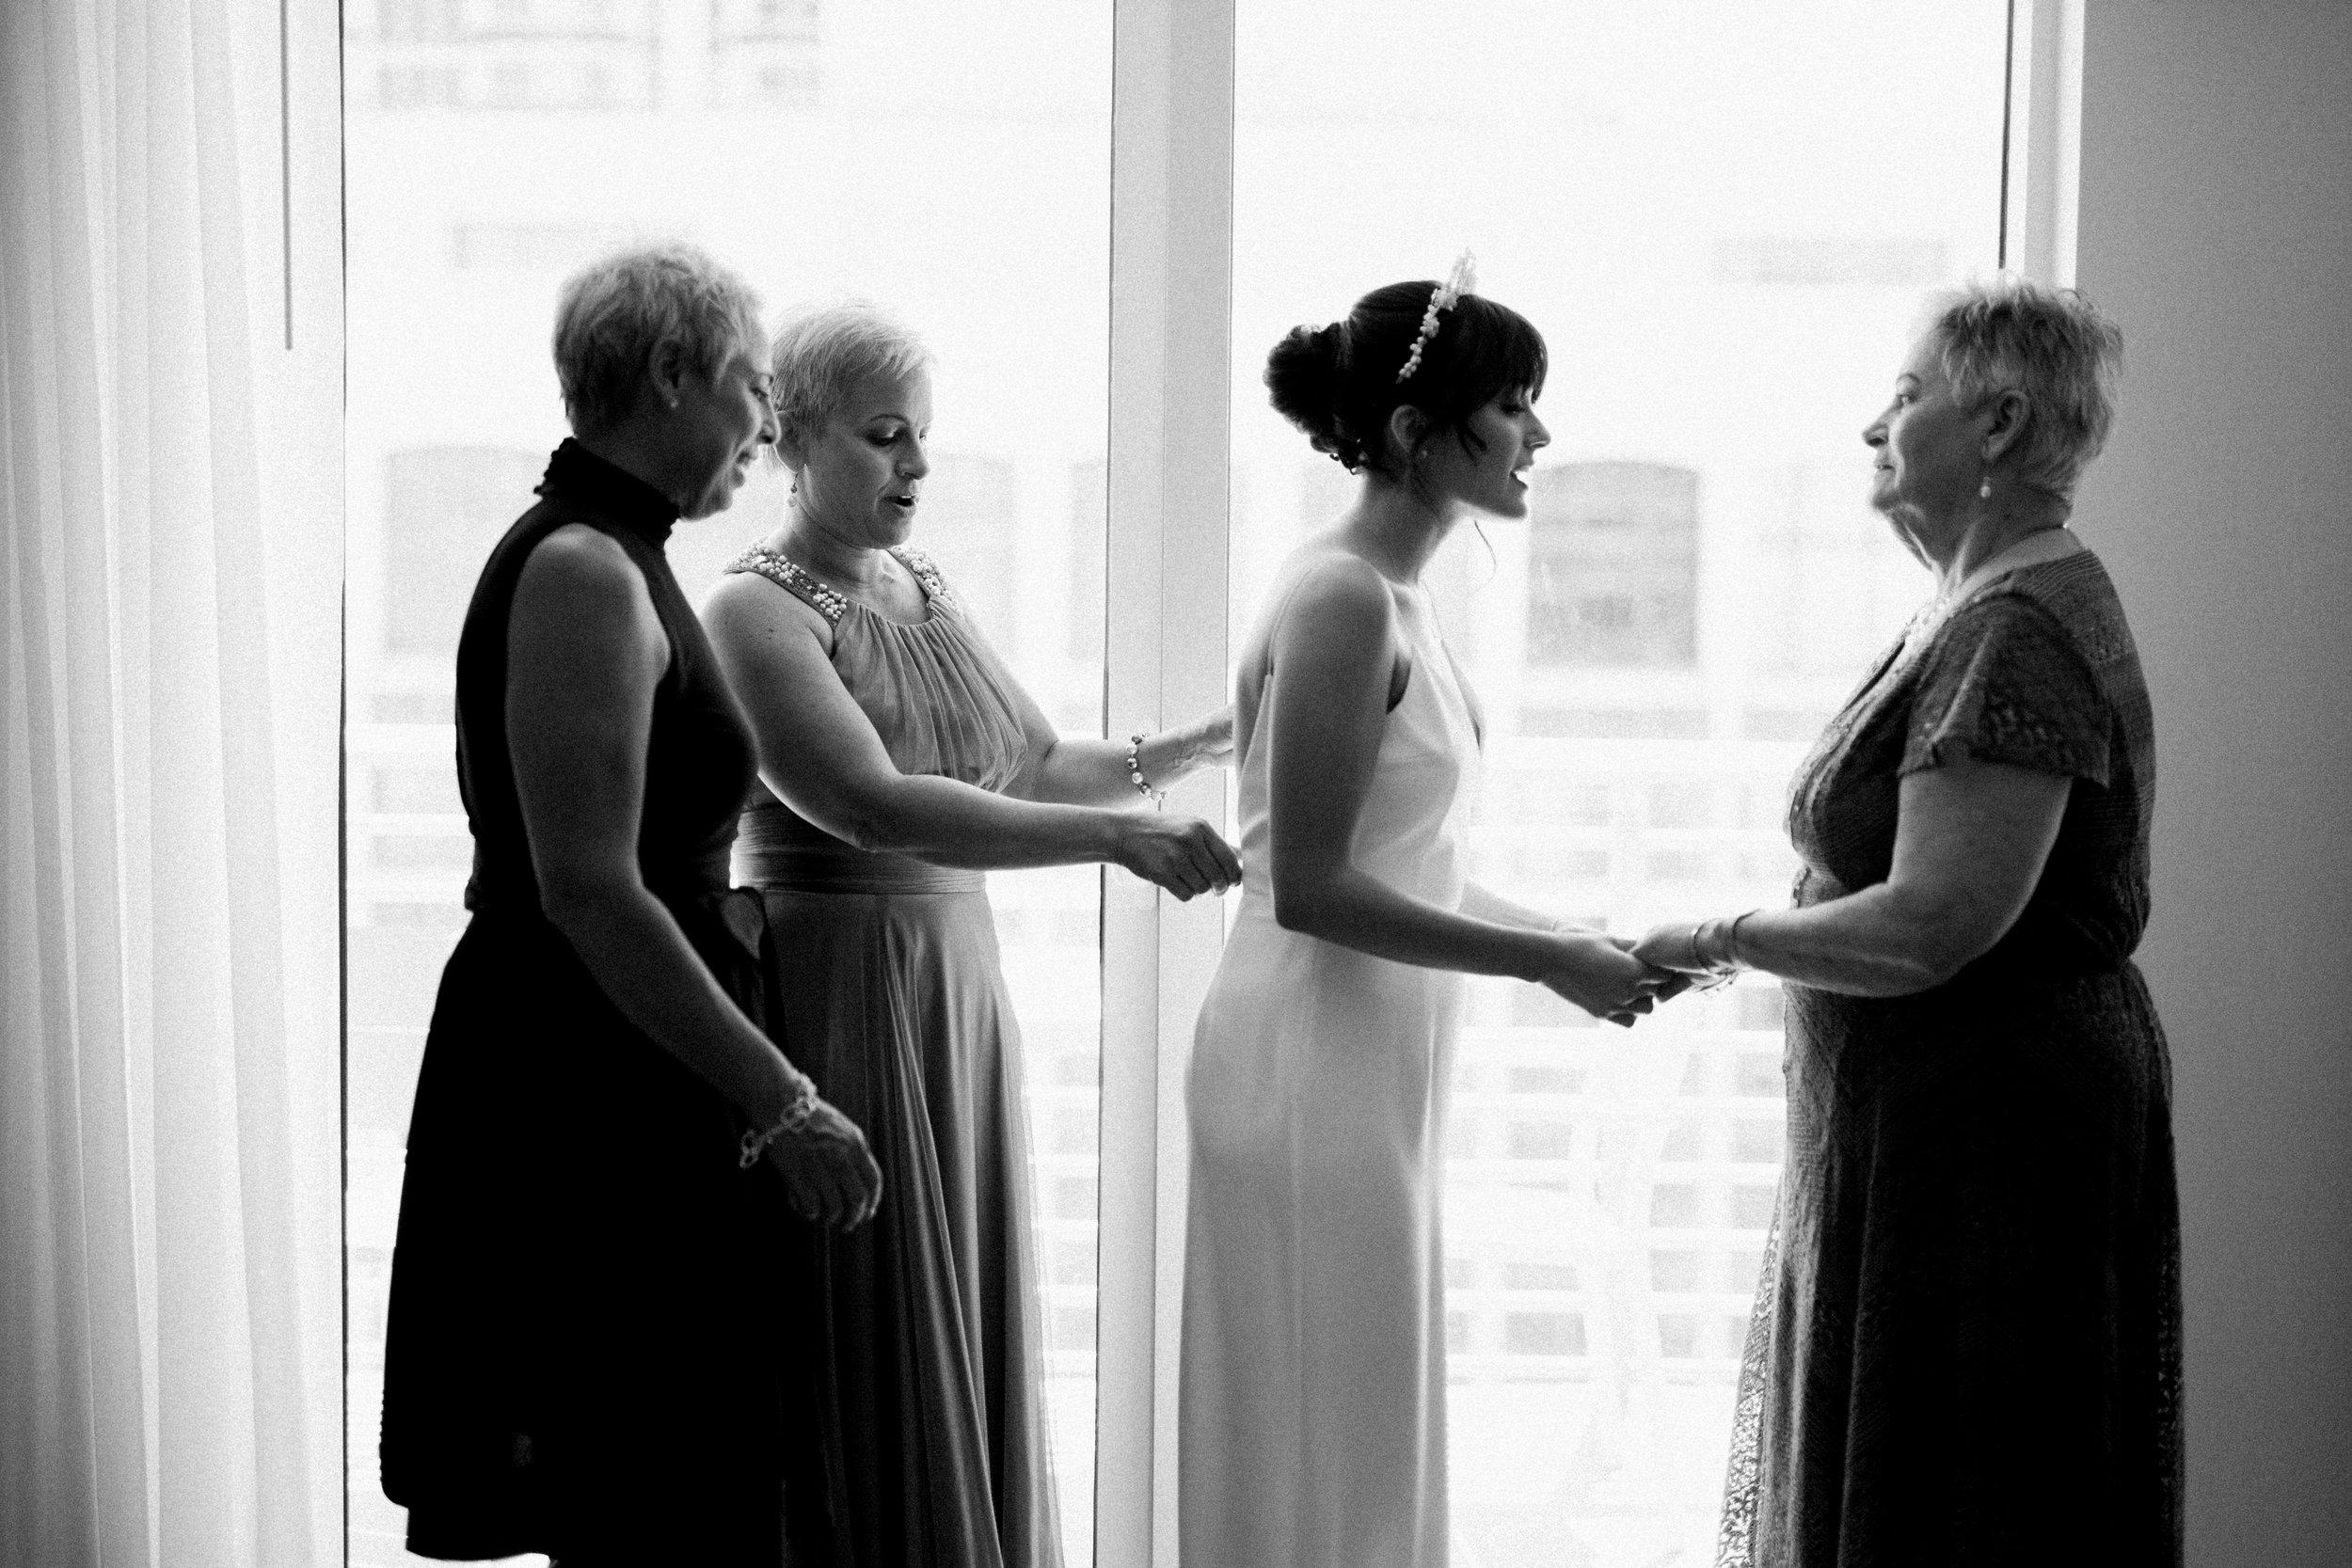 Generational Wedding Portrait by Quinn Moss